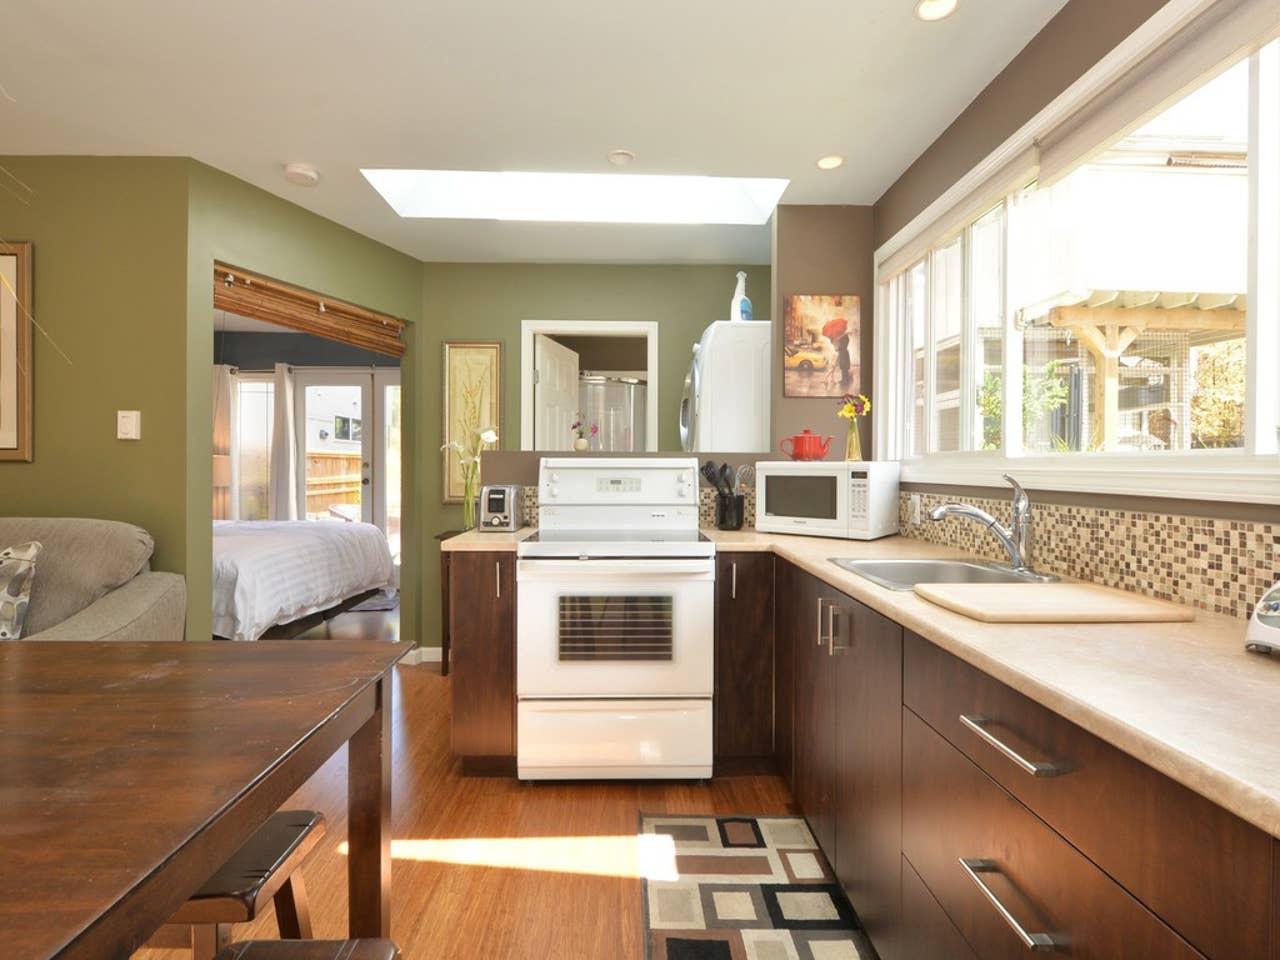 Airbnb Victoria, BC: James Bay cottage